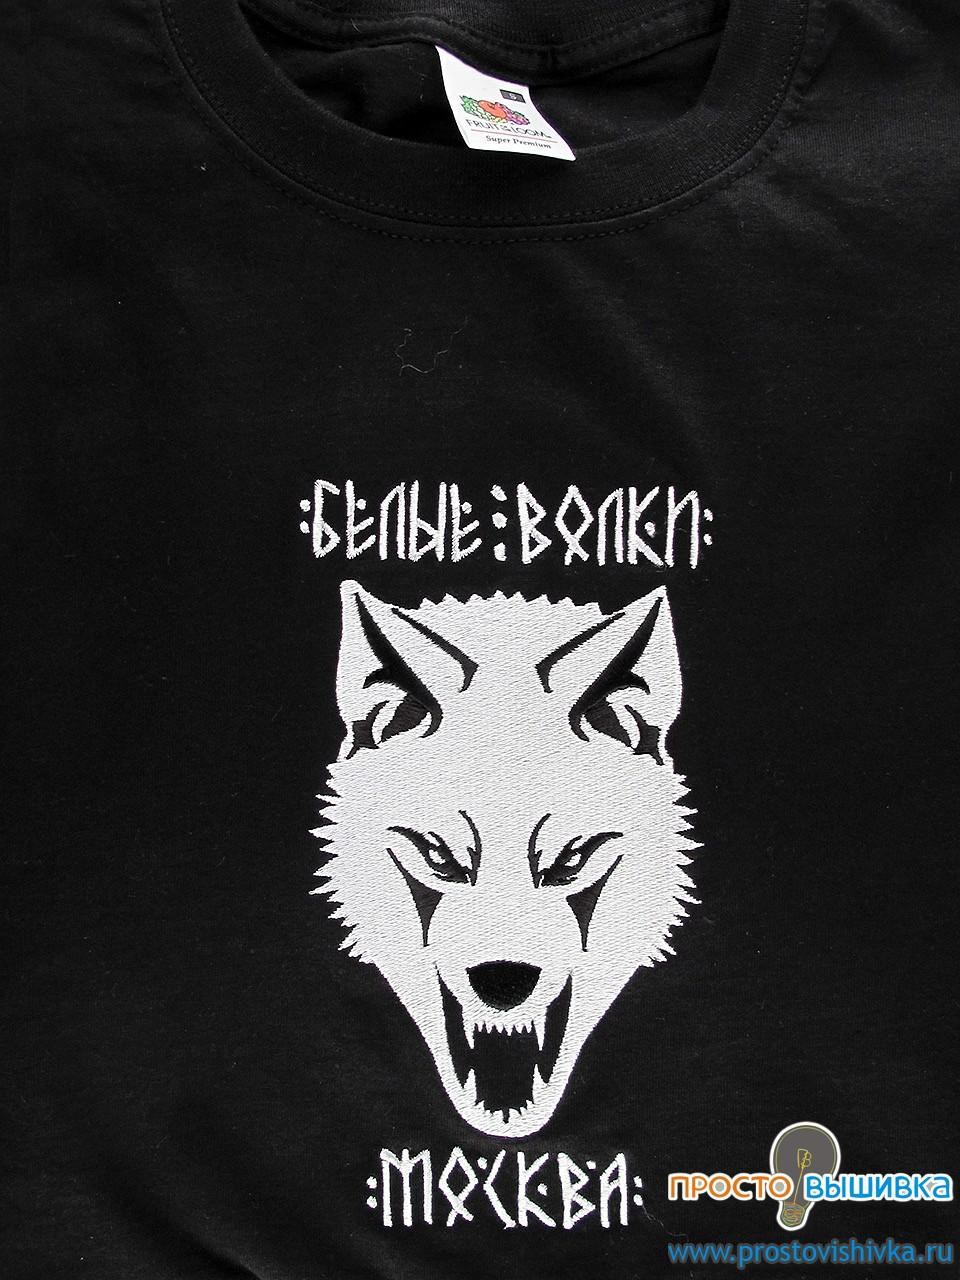 Вышивка на футболке. Футболки с вышивкой на заказ. 36d64e6f573ae